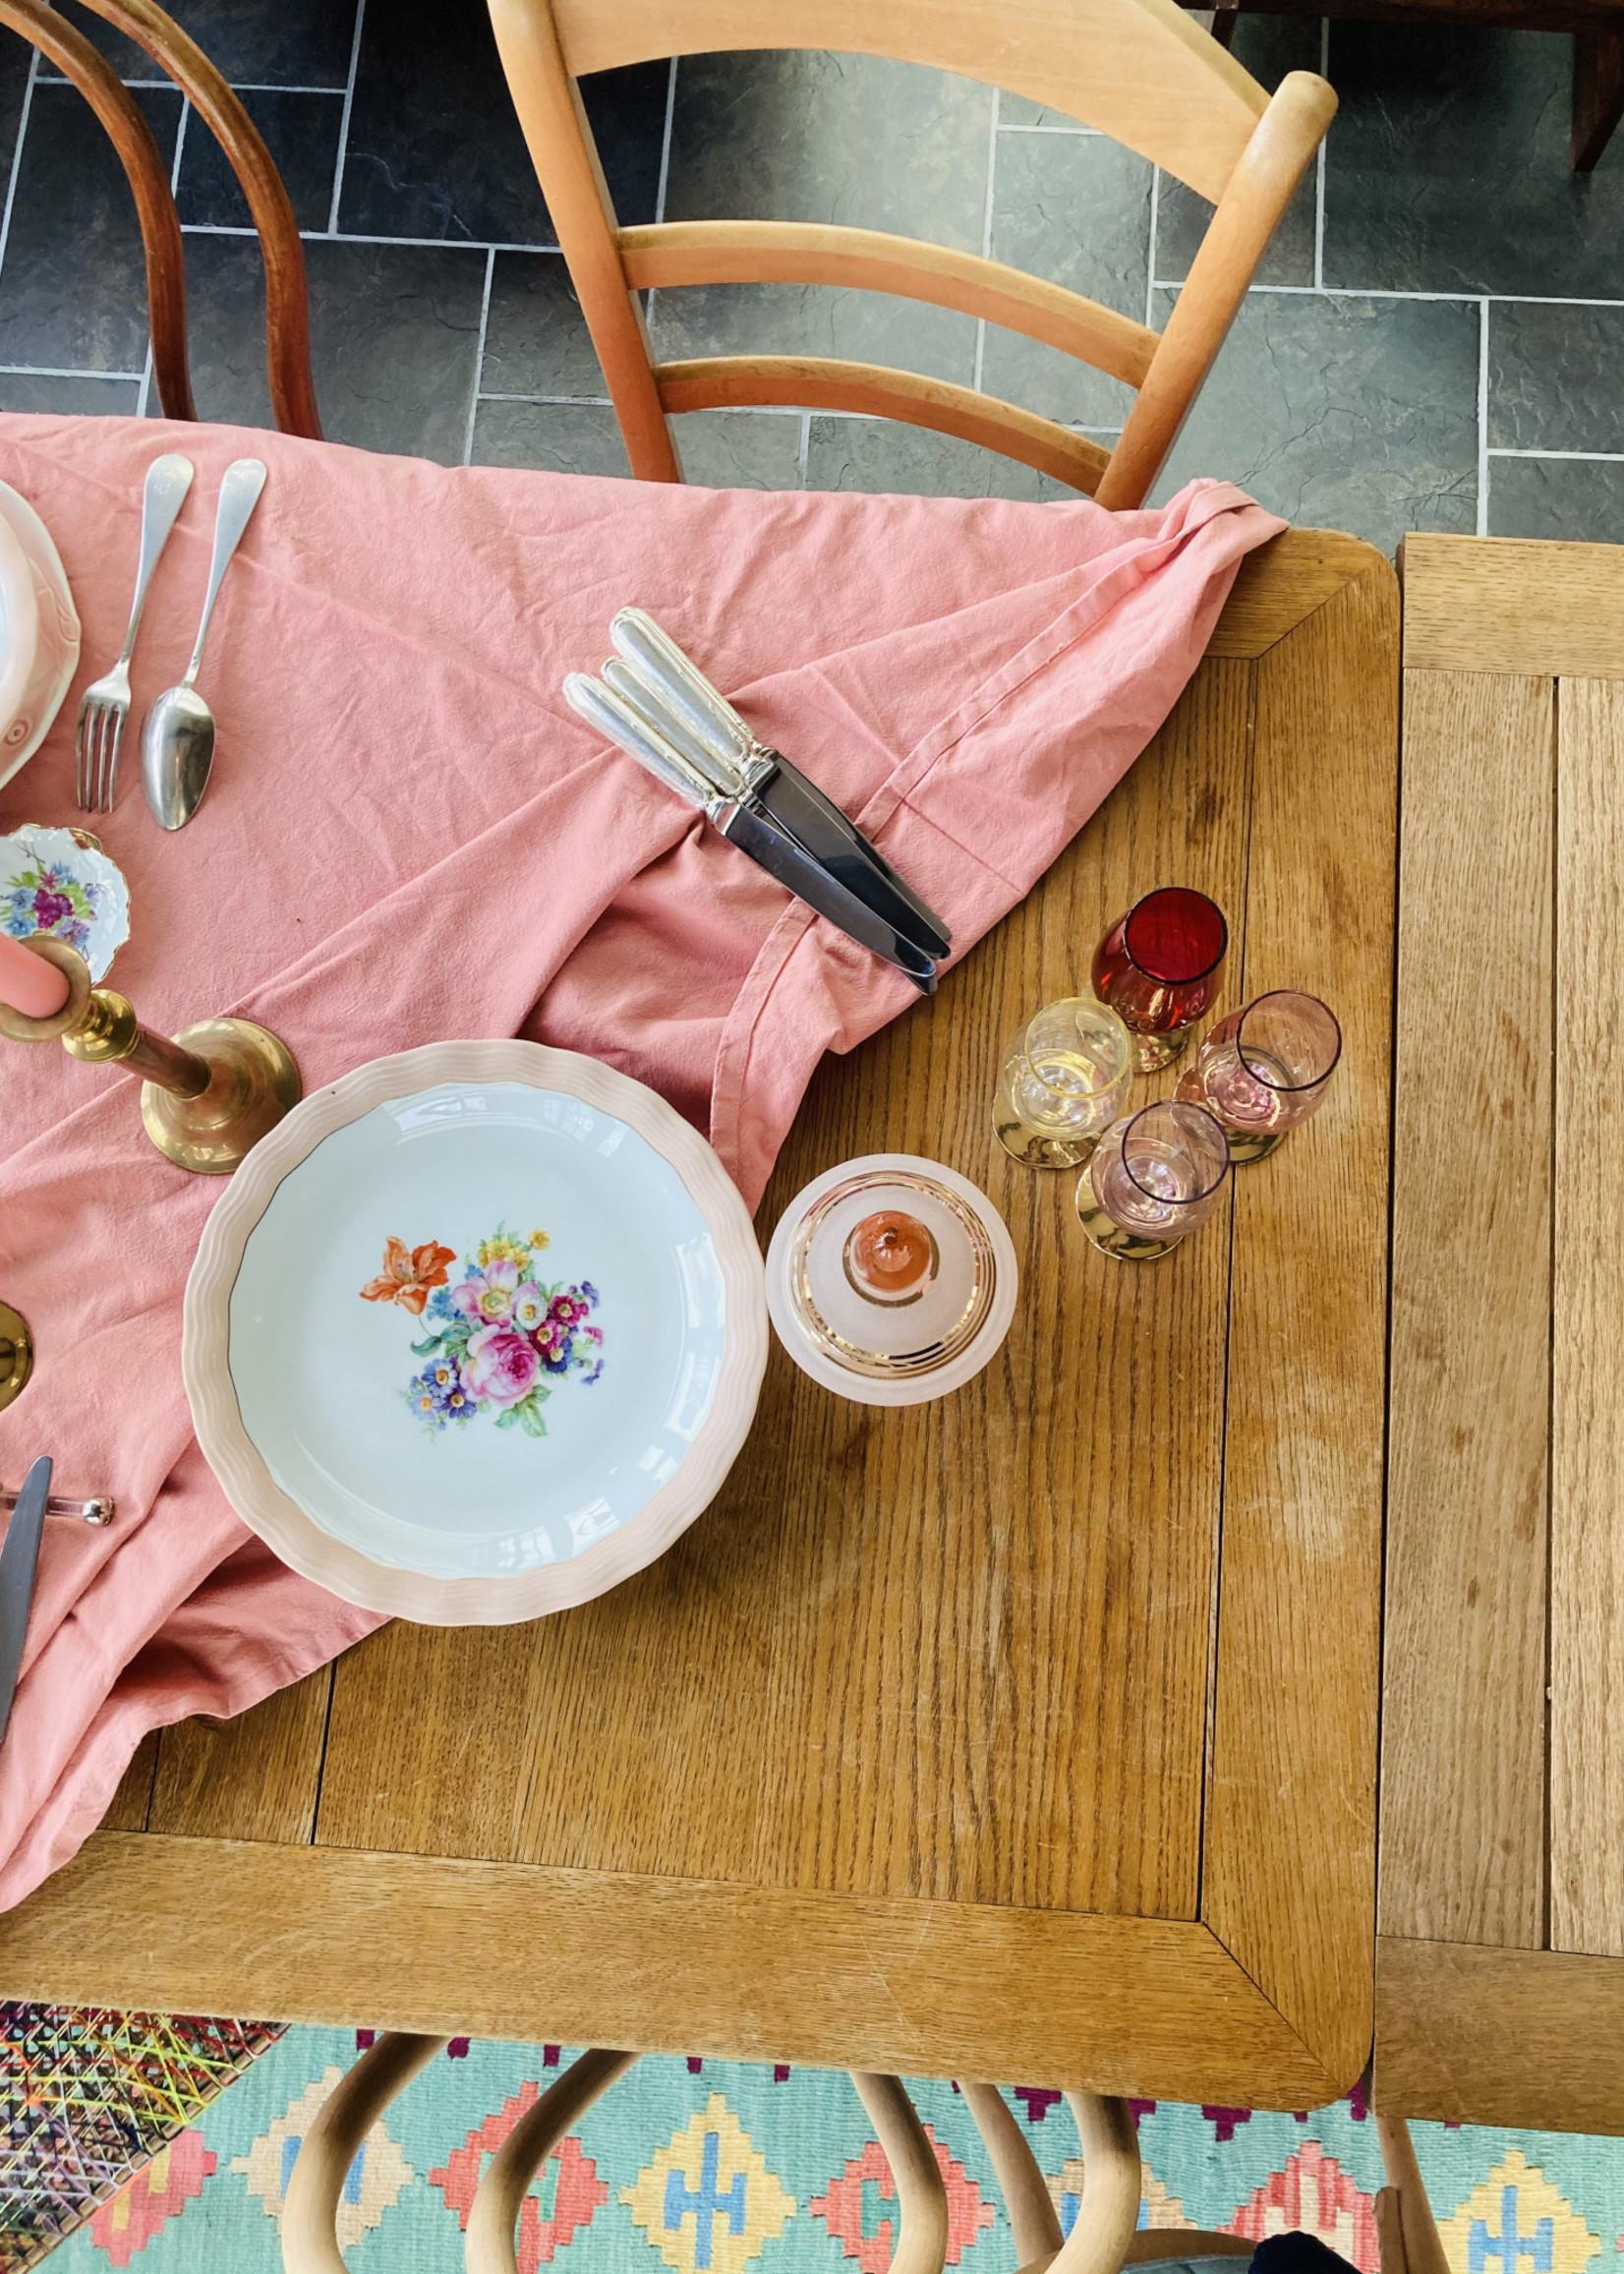 Limoge ULIM, Floral rose, deep plates